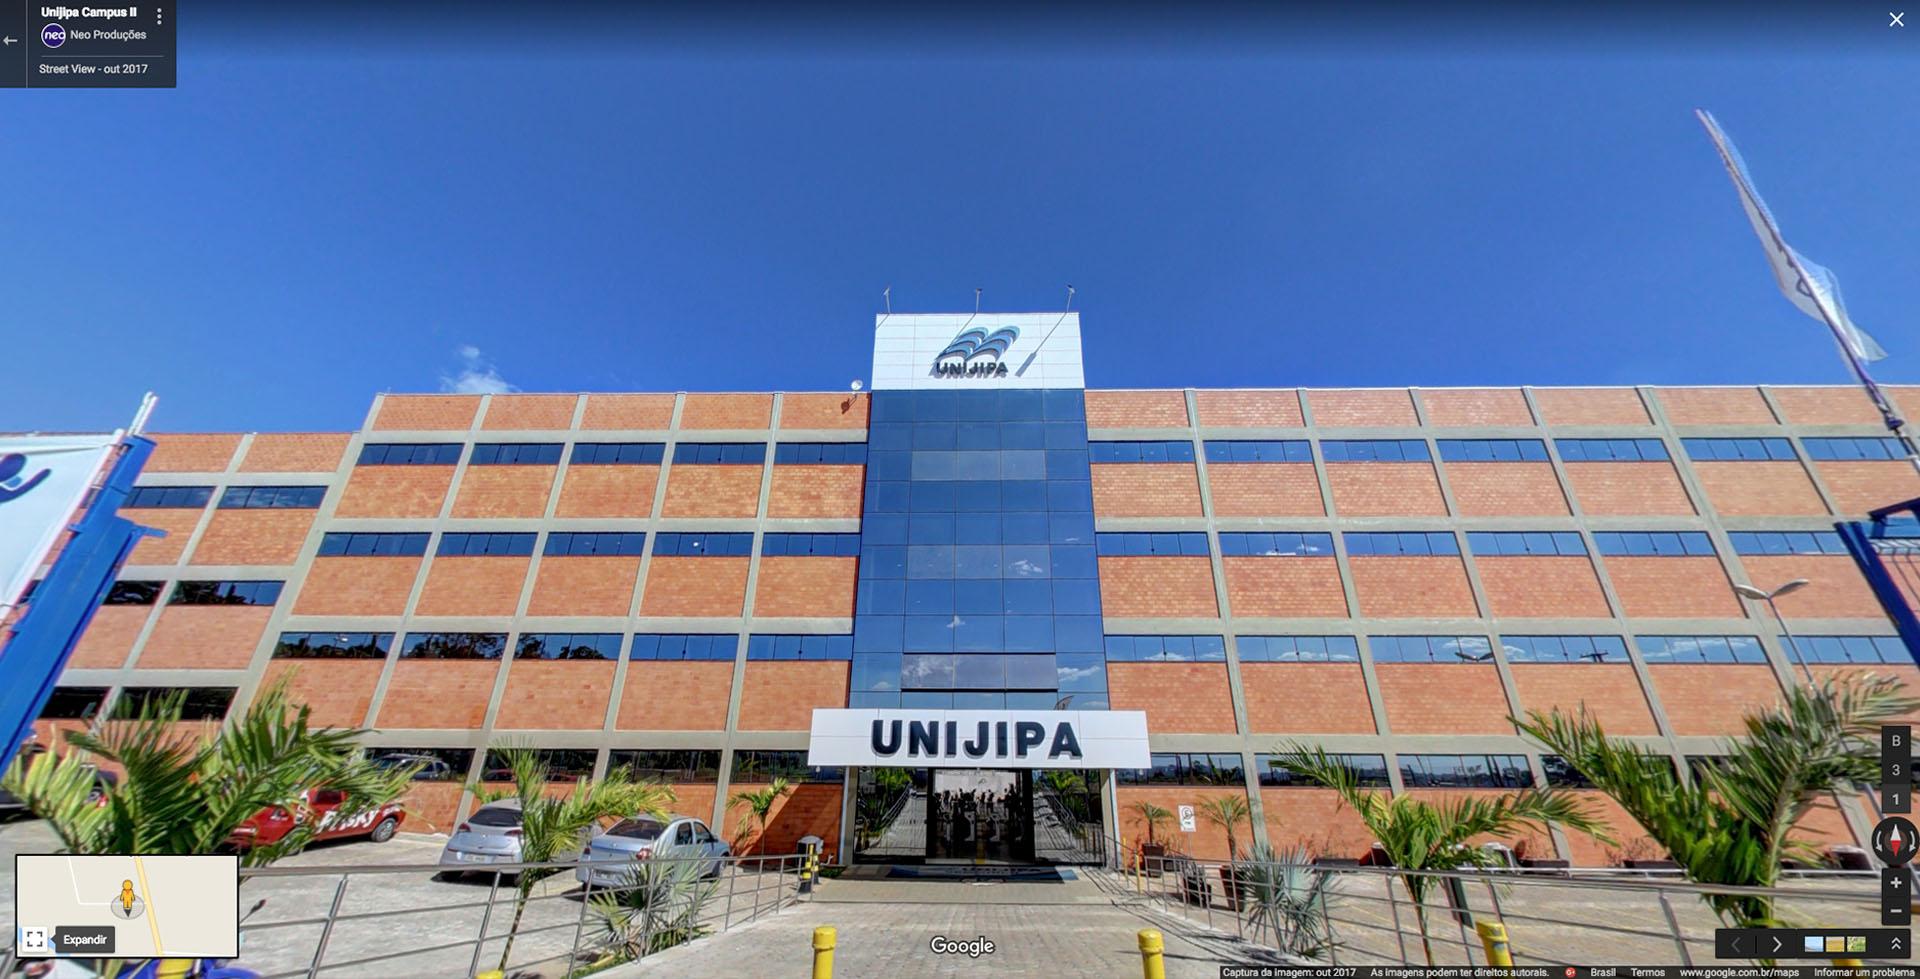 Unijipa - Campus II